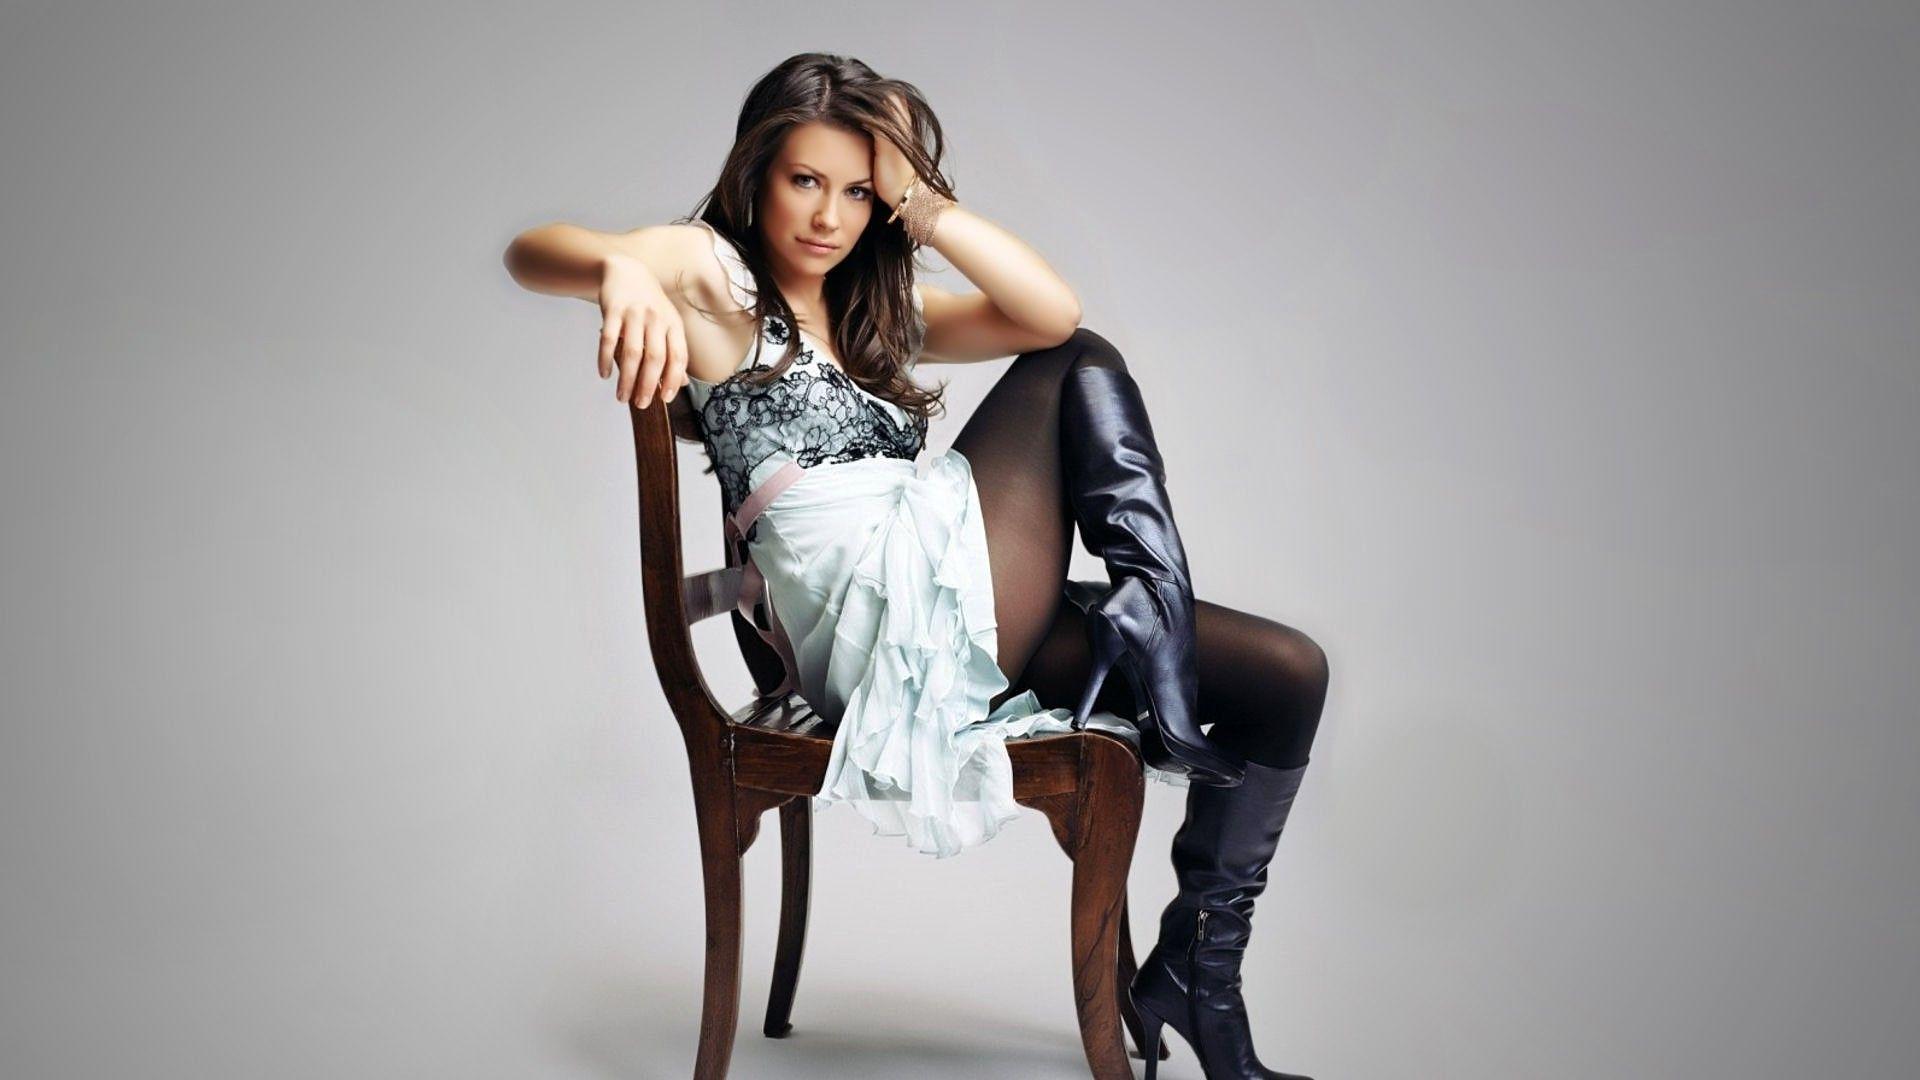 Evangeline Lilly Widescreen for desktop